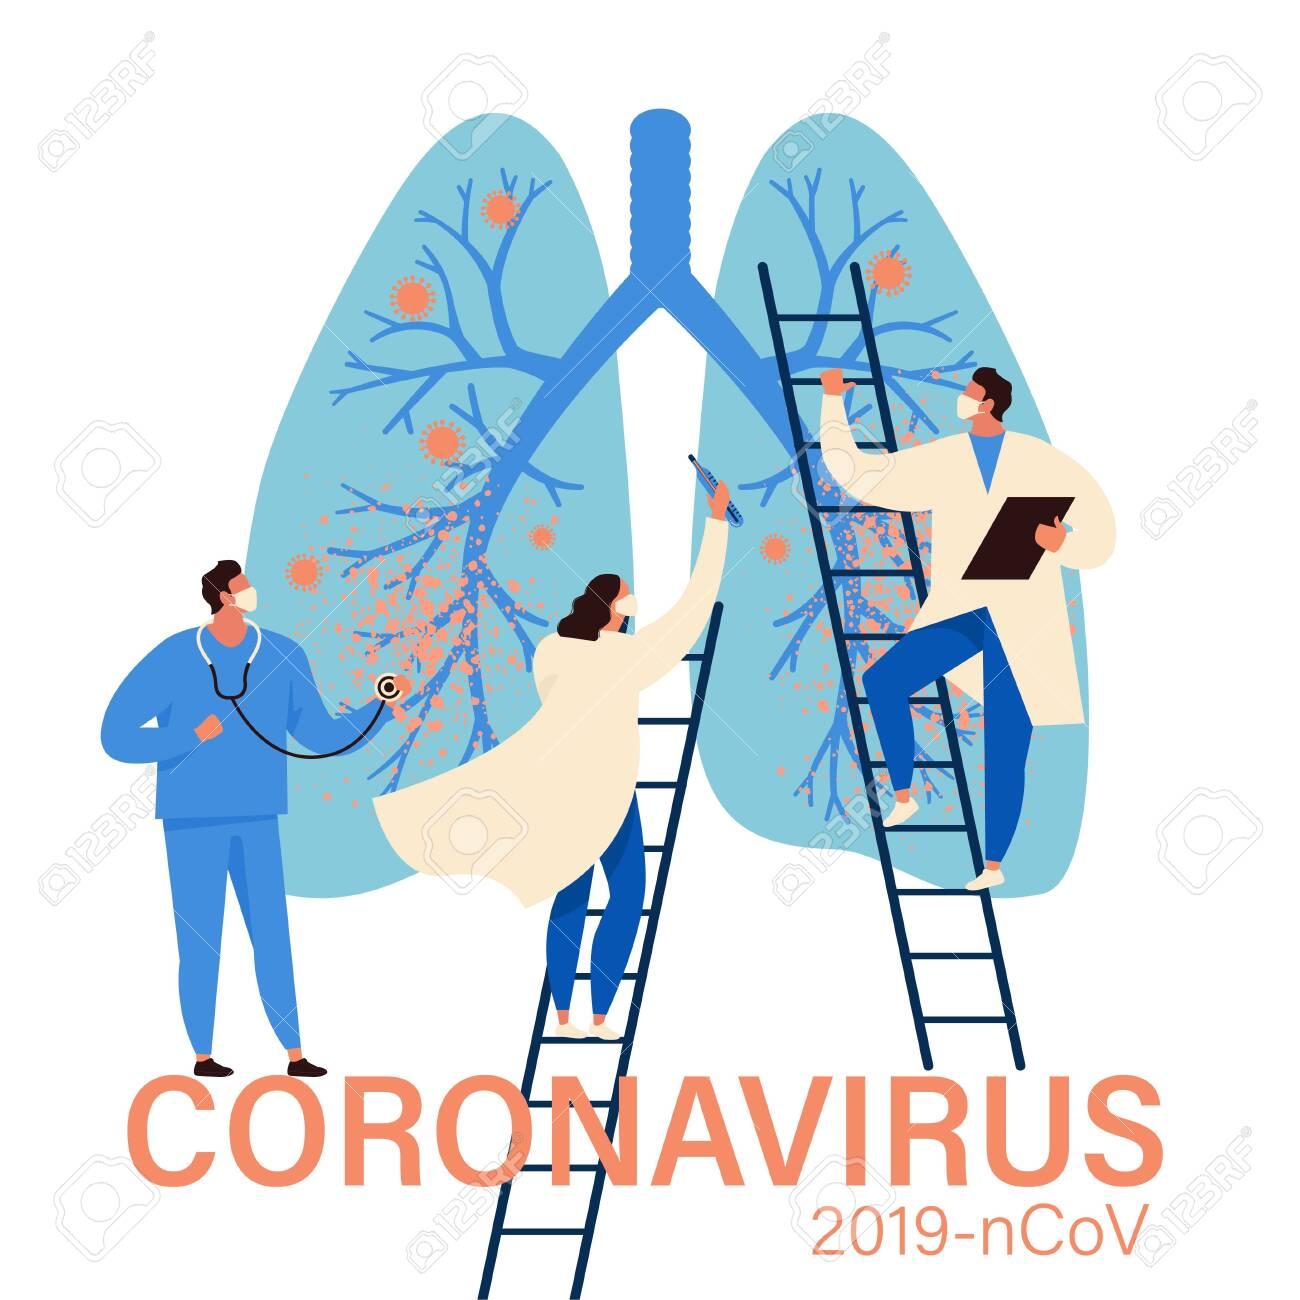 Virus diagnosis and patient treatment abstract concept vector illustration. Coronavirus test kit, coronavirus patient isolation quarantine and treatment, vaccine development abstract metaphor. - 140819204